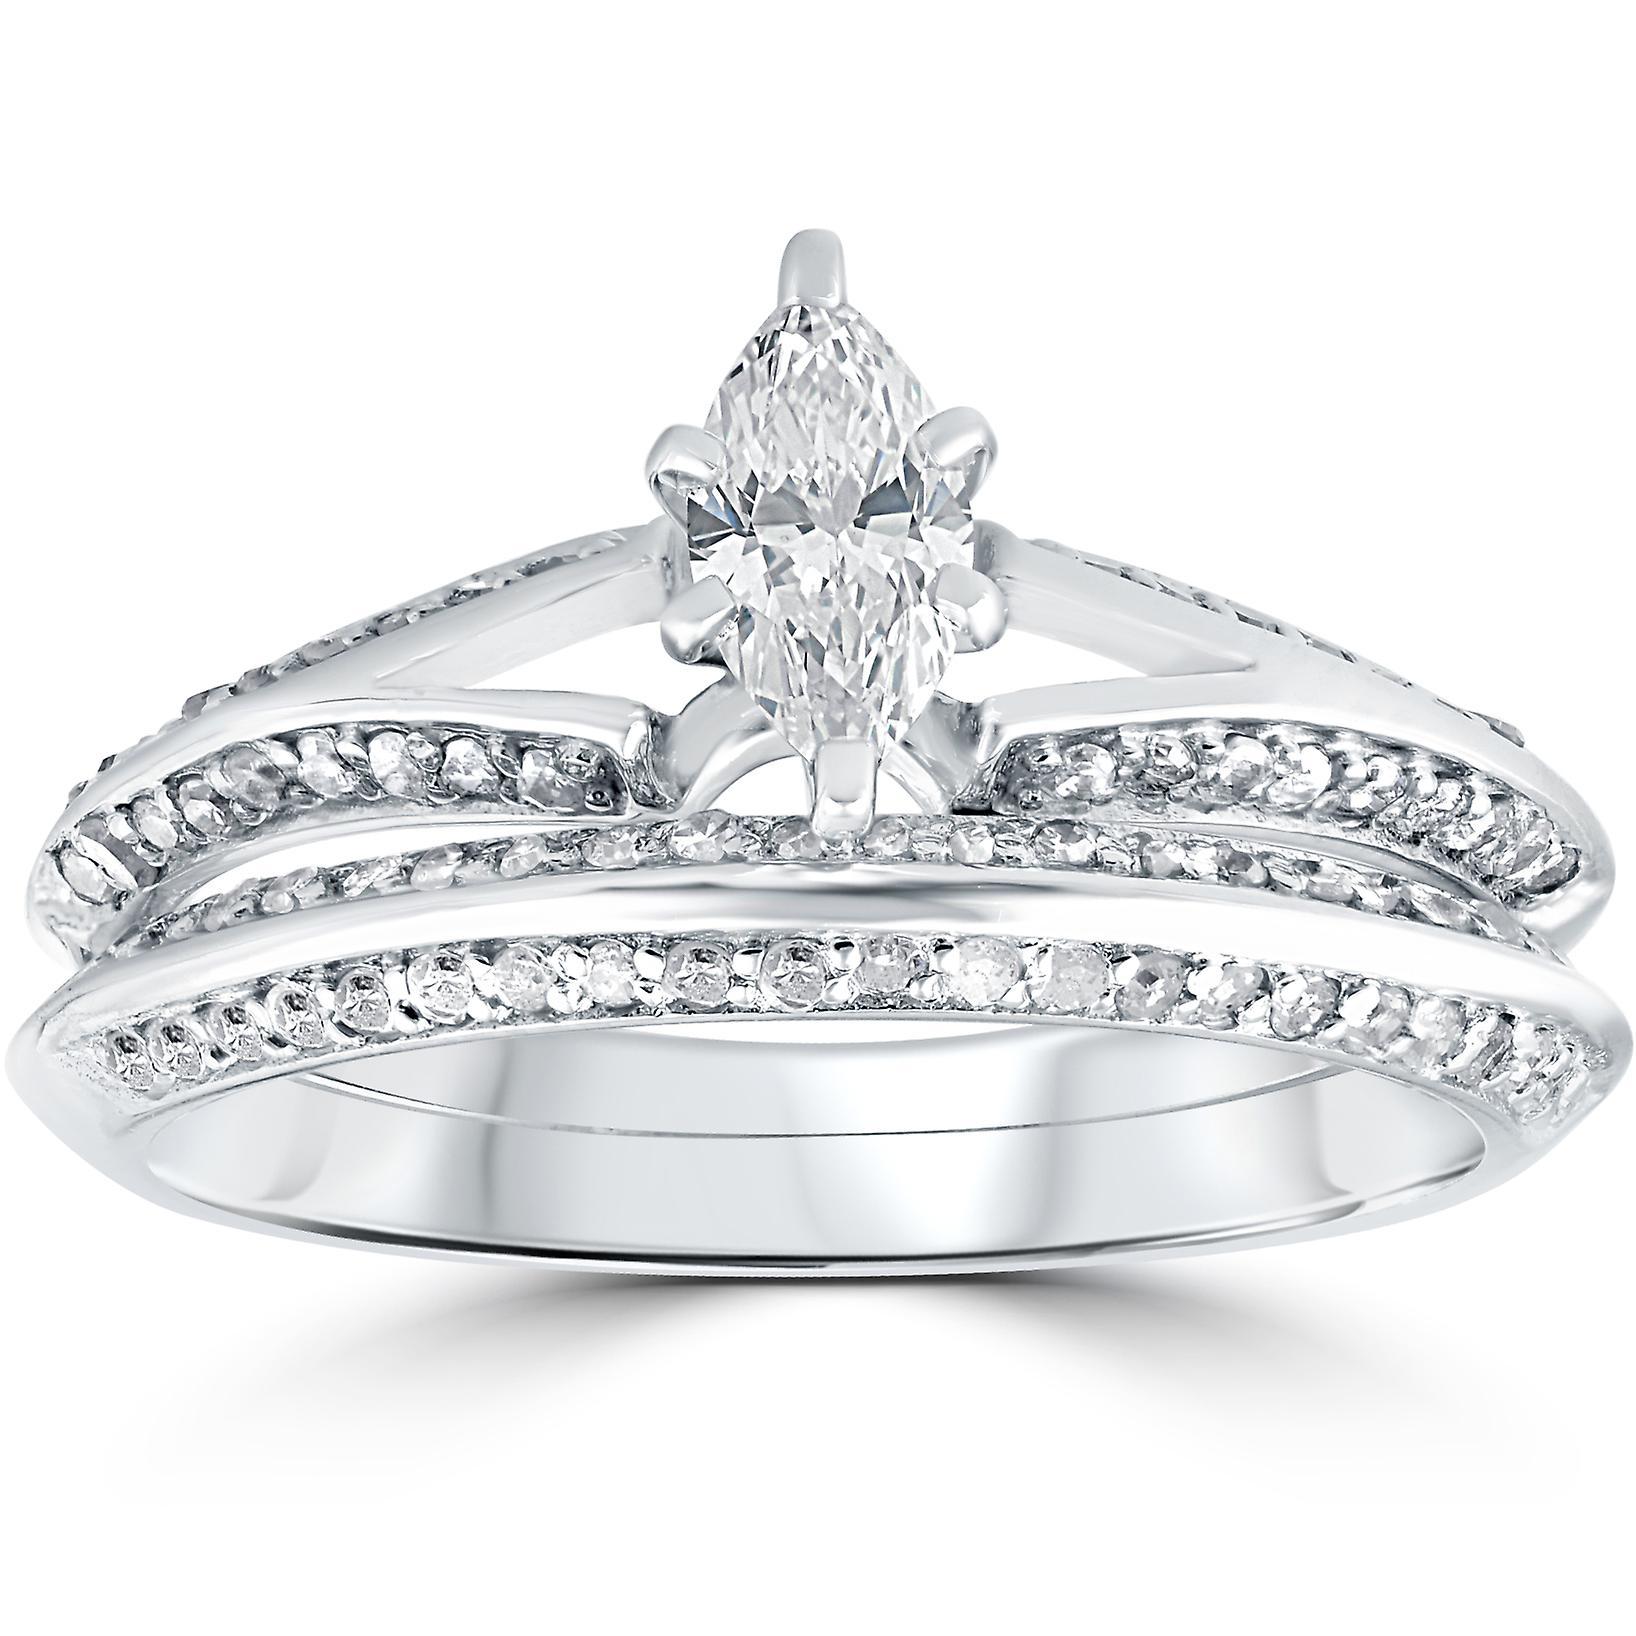 3 4 Ct Marquise Diamond Engagement Wedding Ring Set 14k White Gold